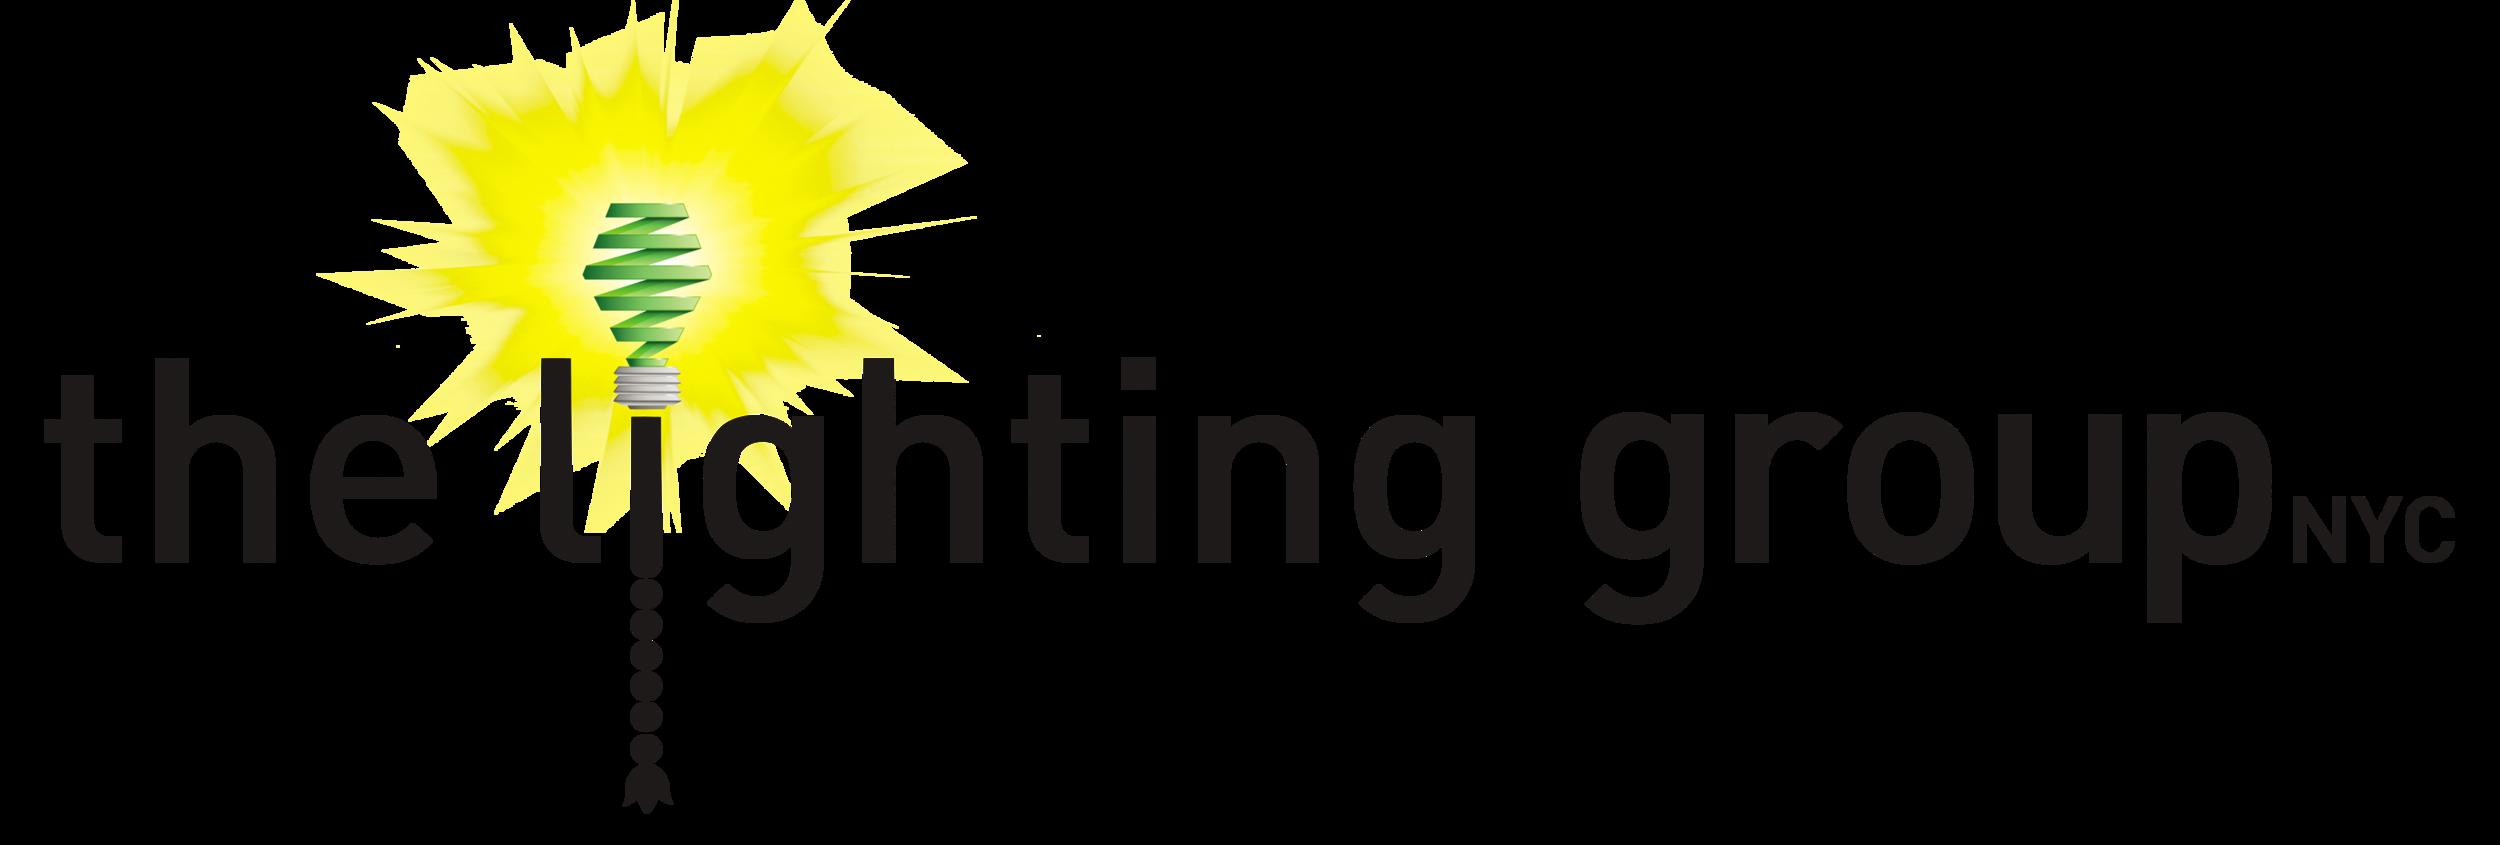 TLG_Logo_Yellow_Burst.png